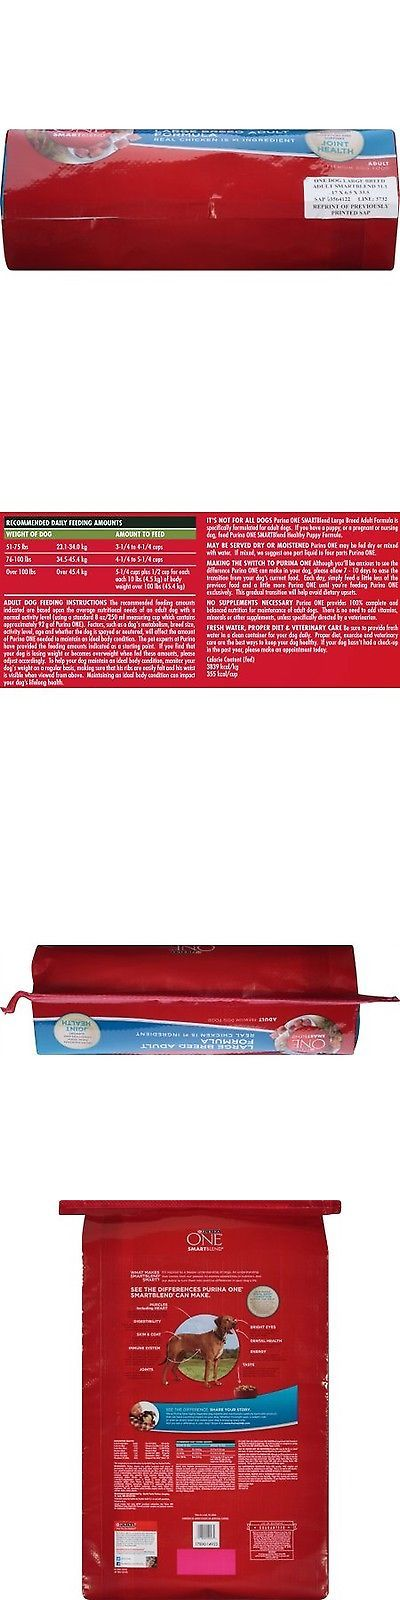 Dog Food 66780: Purina One Smartblend Large Breed Adult Formula Adult Premium Dog Food 31.1 L... BUY IT NOW ONLY: $45.99